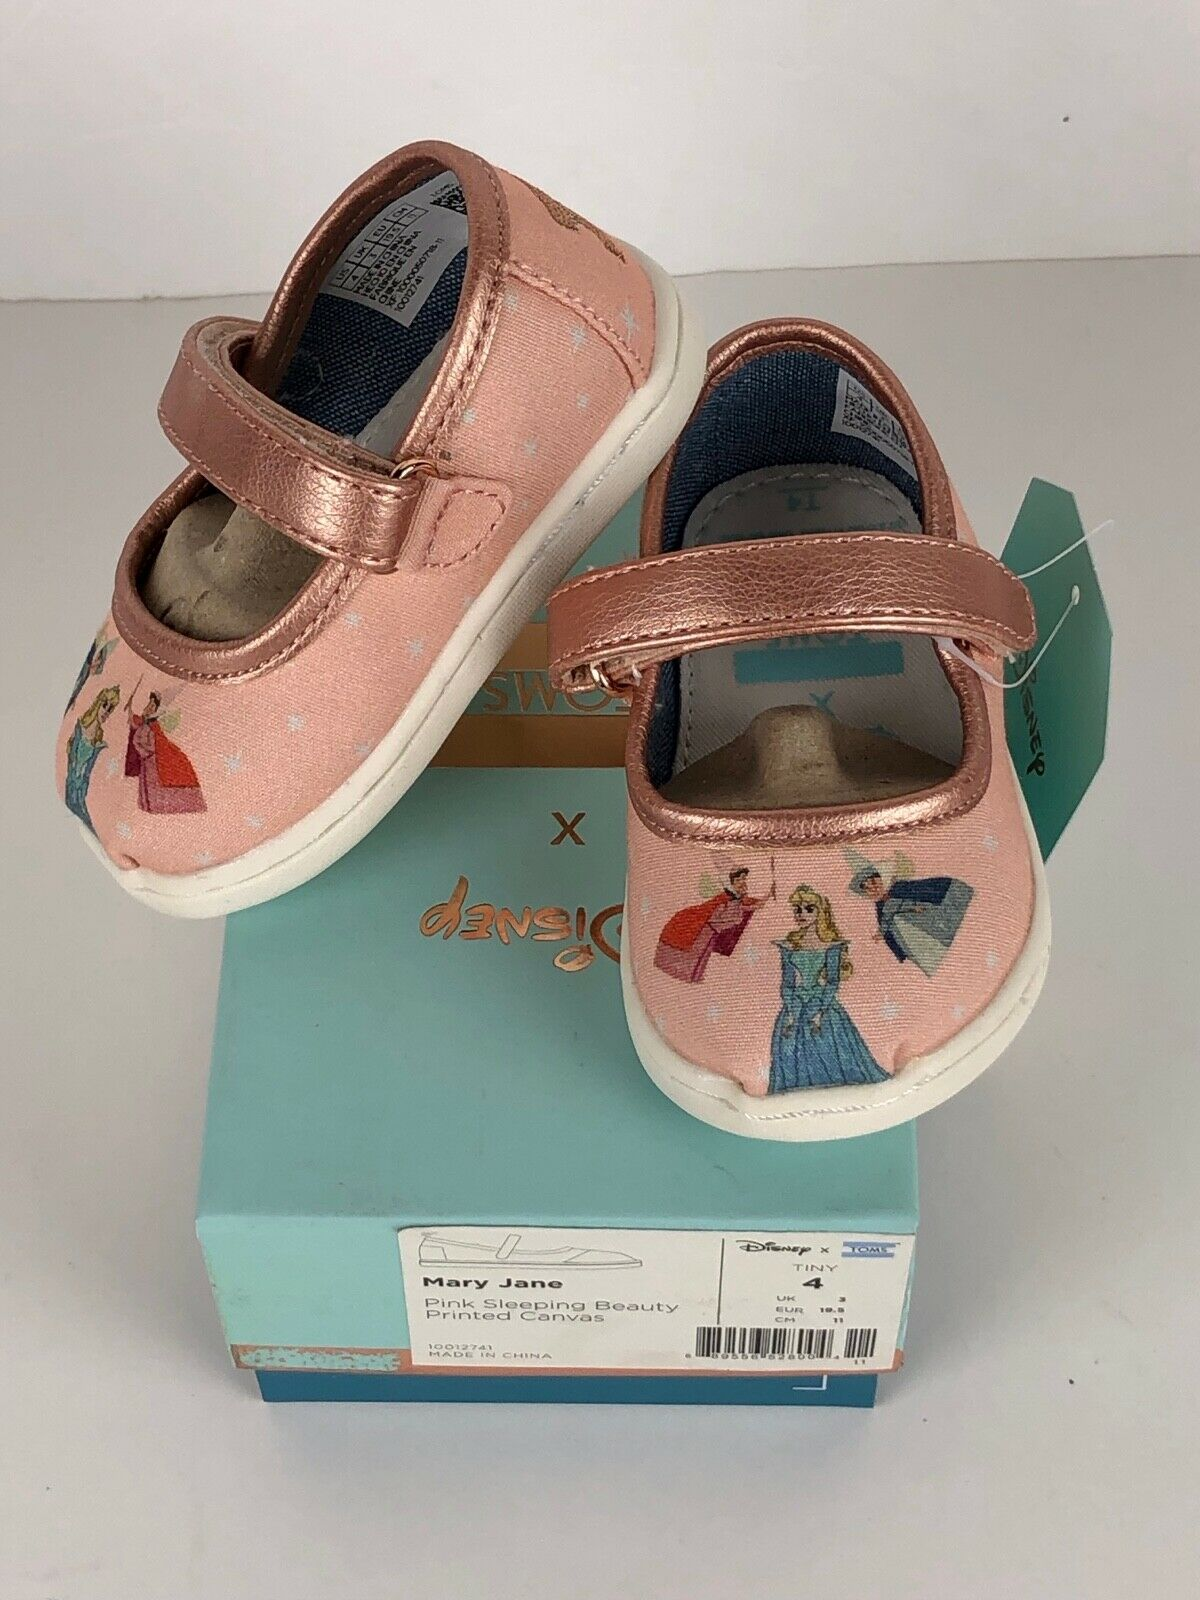 df68b5b24e0 Toms Tiny Mary Jane Pink Sleeping Beauty Printed Canvas 10012741 ...